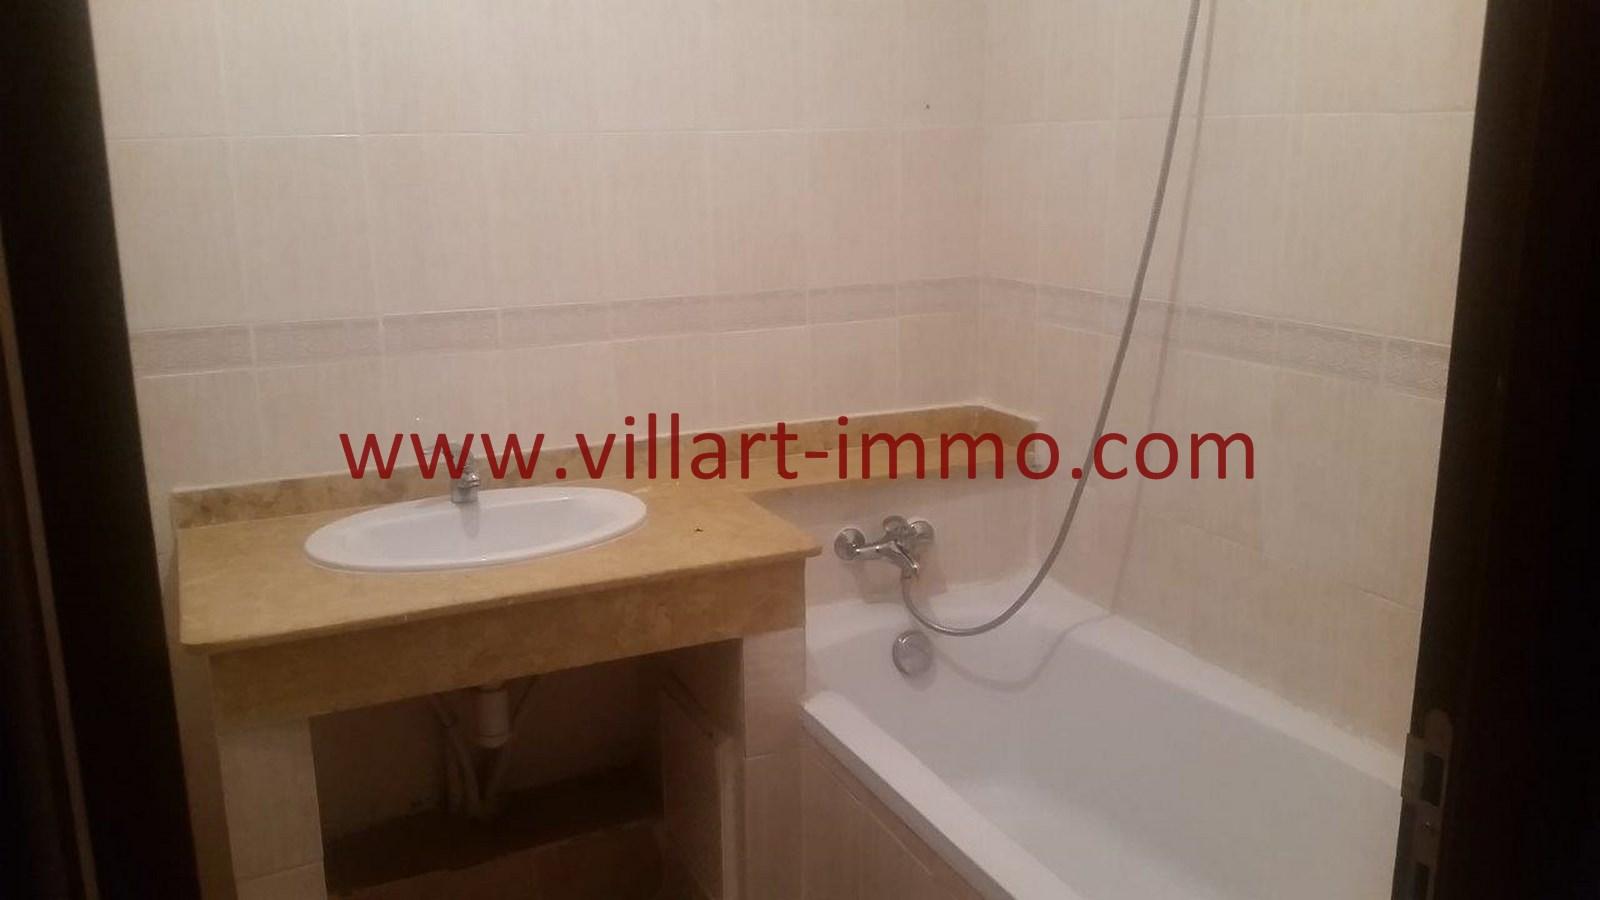 7-Location-Appartement-Non meublé-Tanger-Salle de bain 2L913-Villart immo